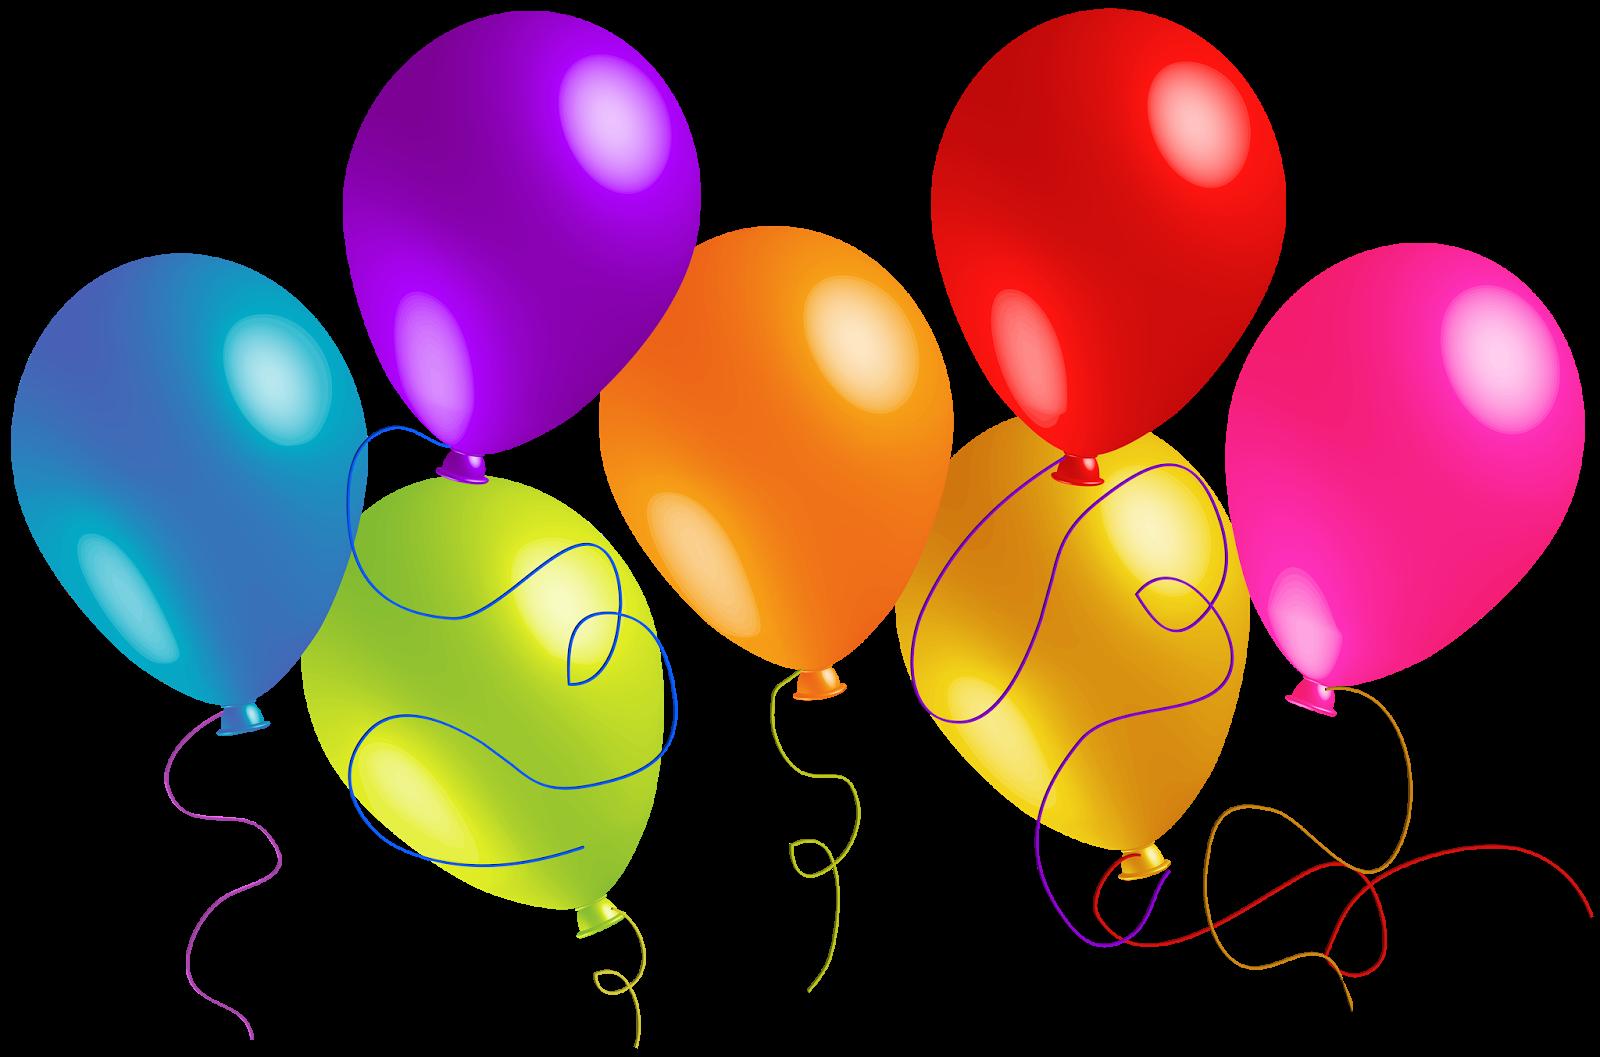 HAPPY BIRTHDAY BALLOONS CLIP ART FREE N27